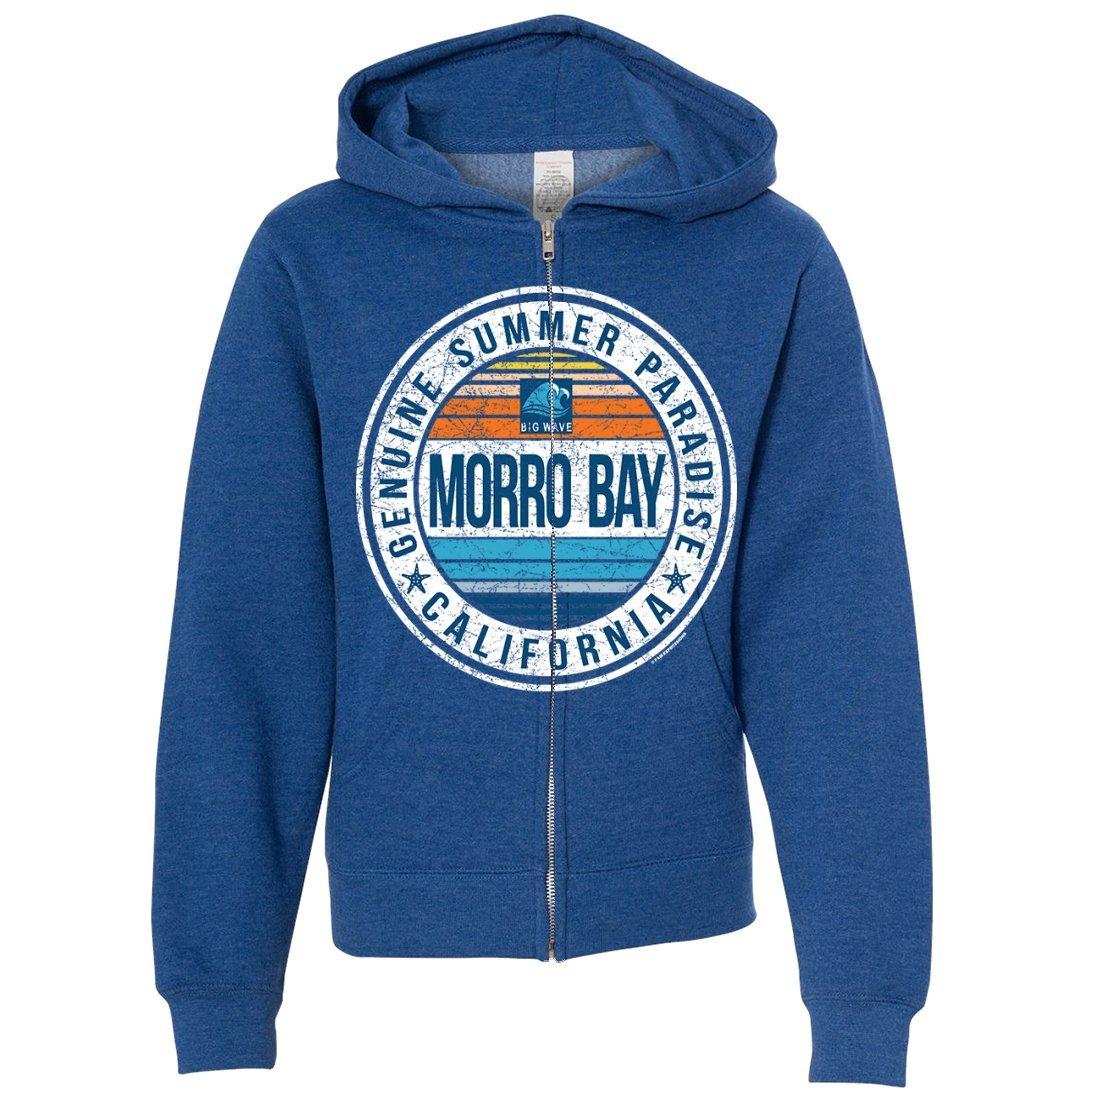 Dolphin Shirt Co Genuine Summer Paradise Premium Youth Zip-up Hoodie - Royal Heather Medium